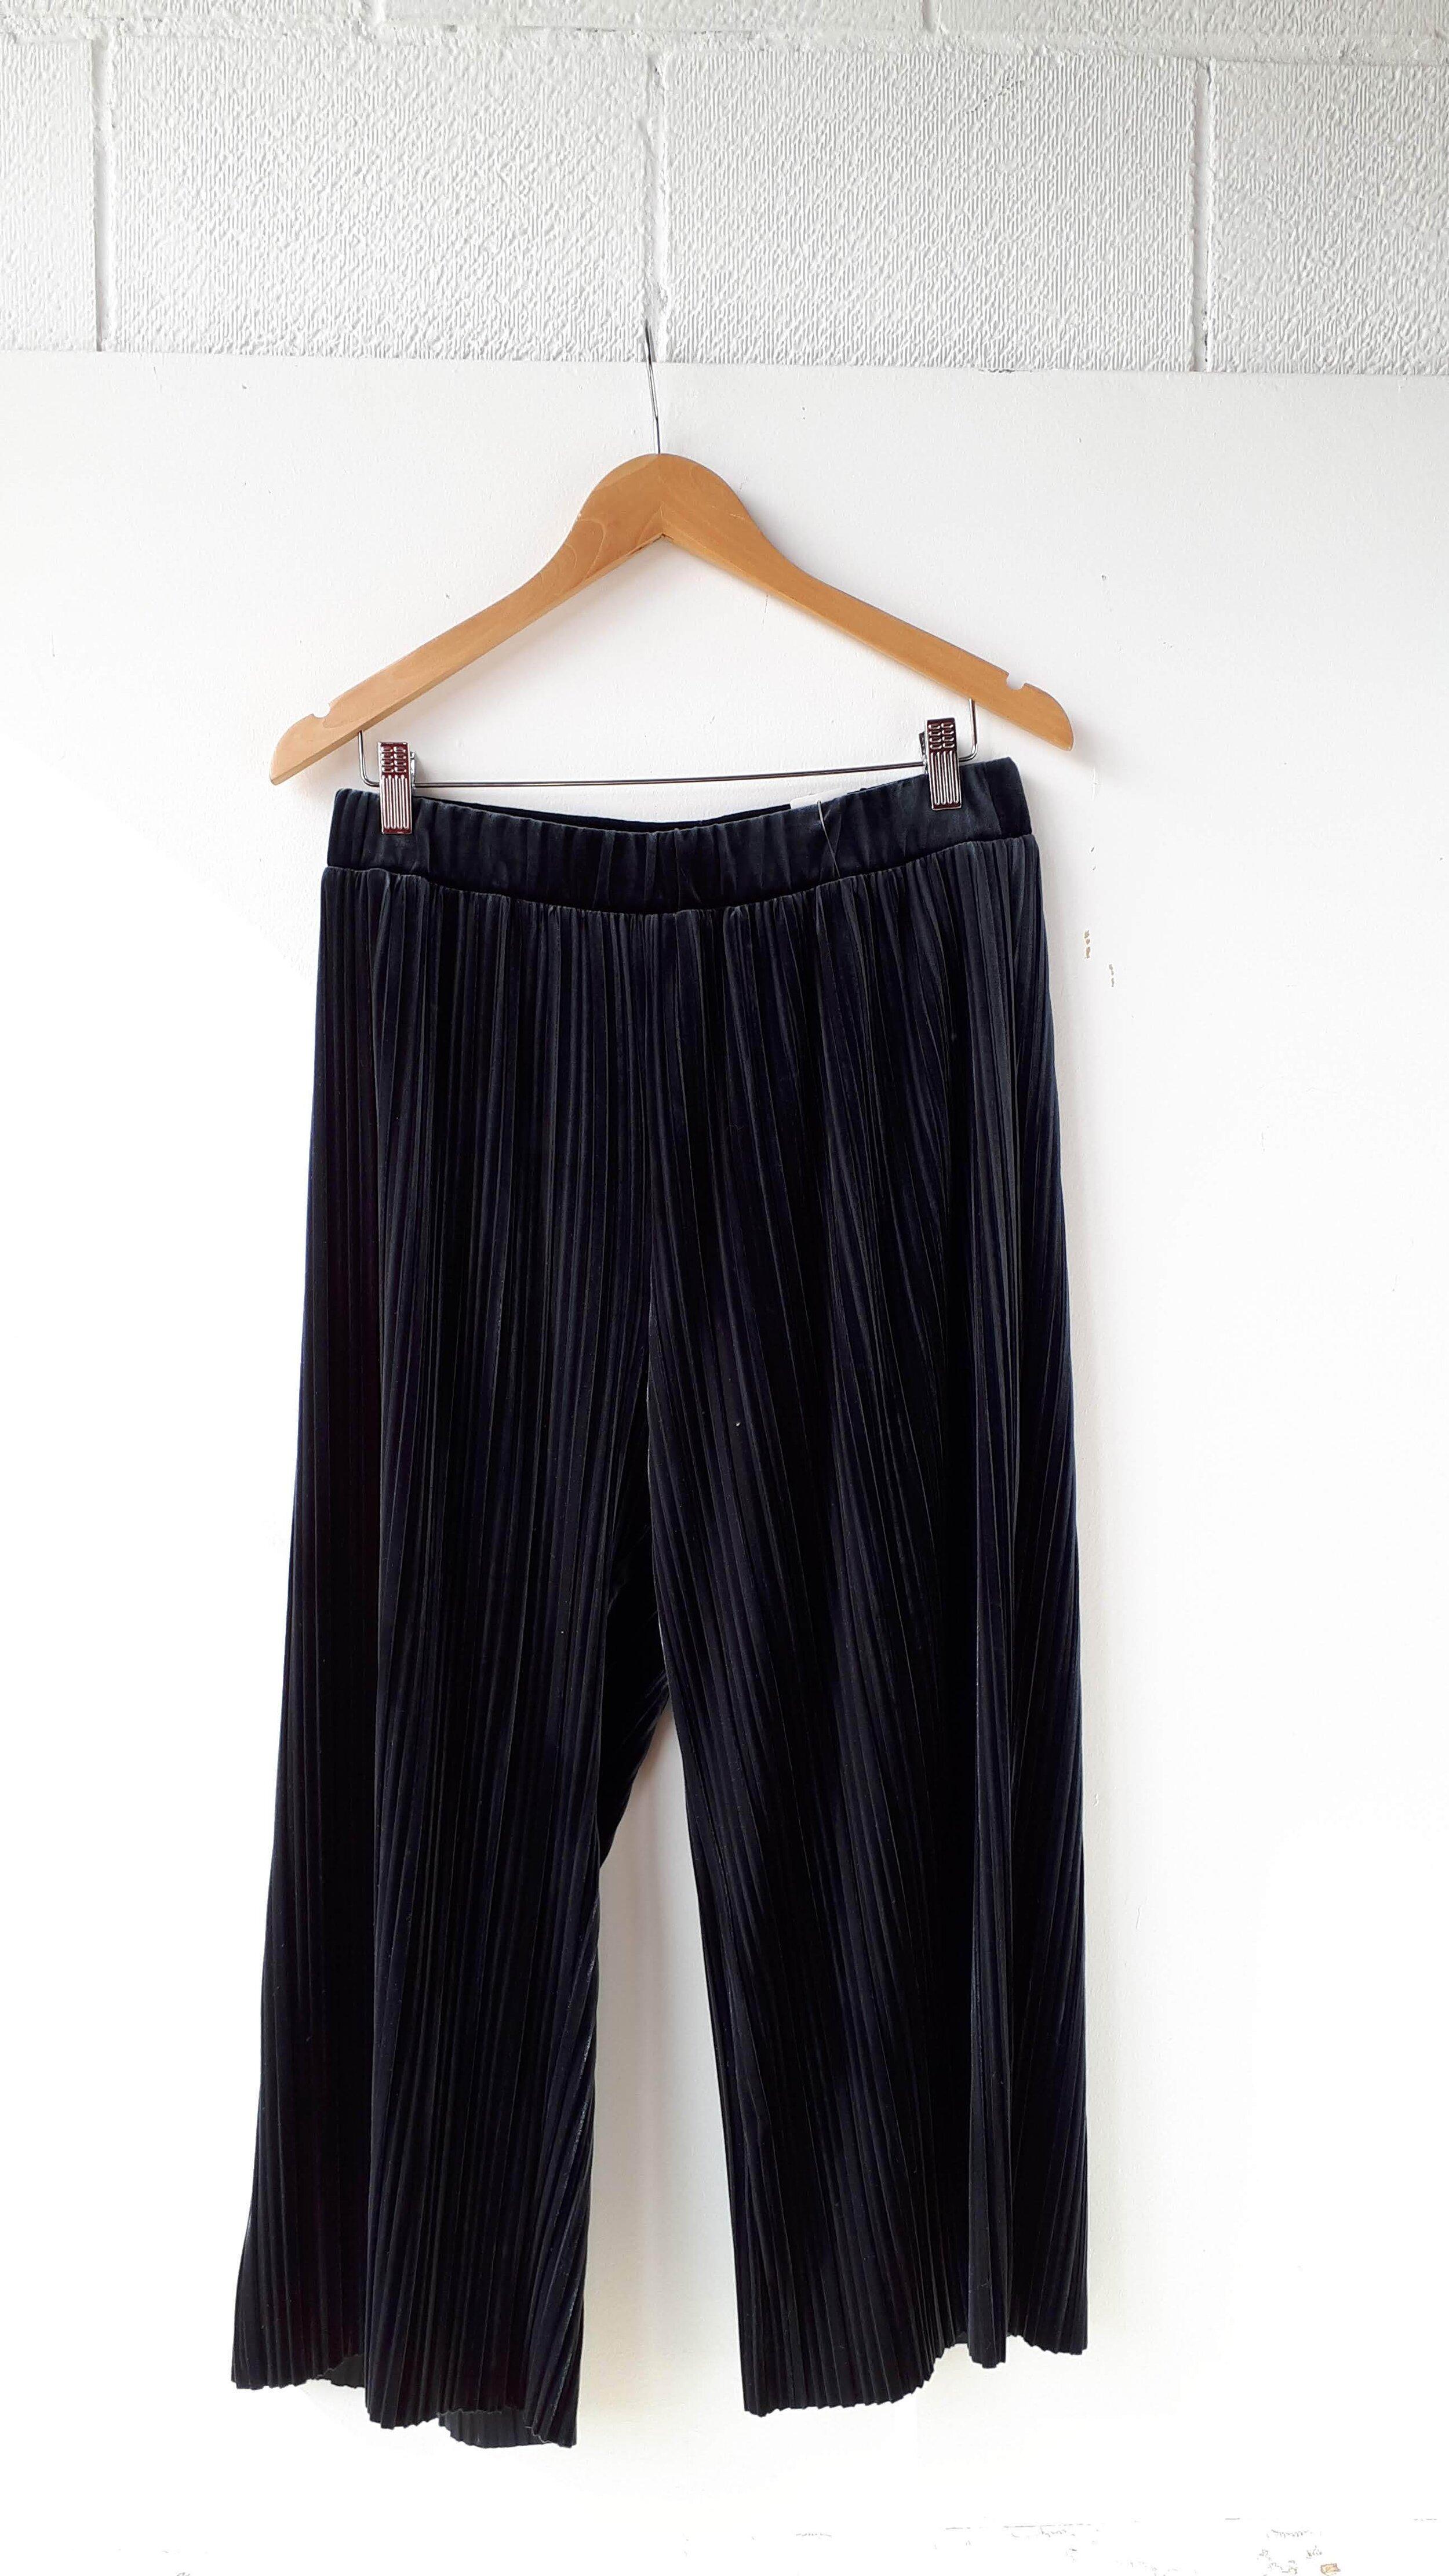 Velvet pants; Size L, $32